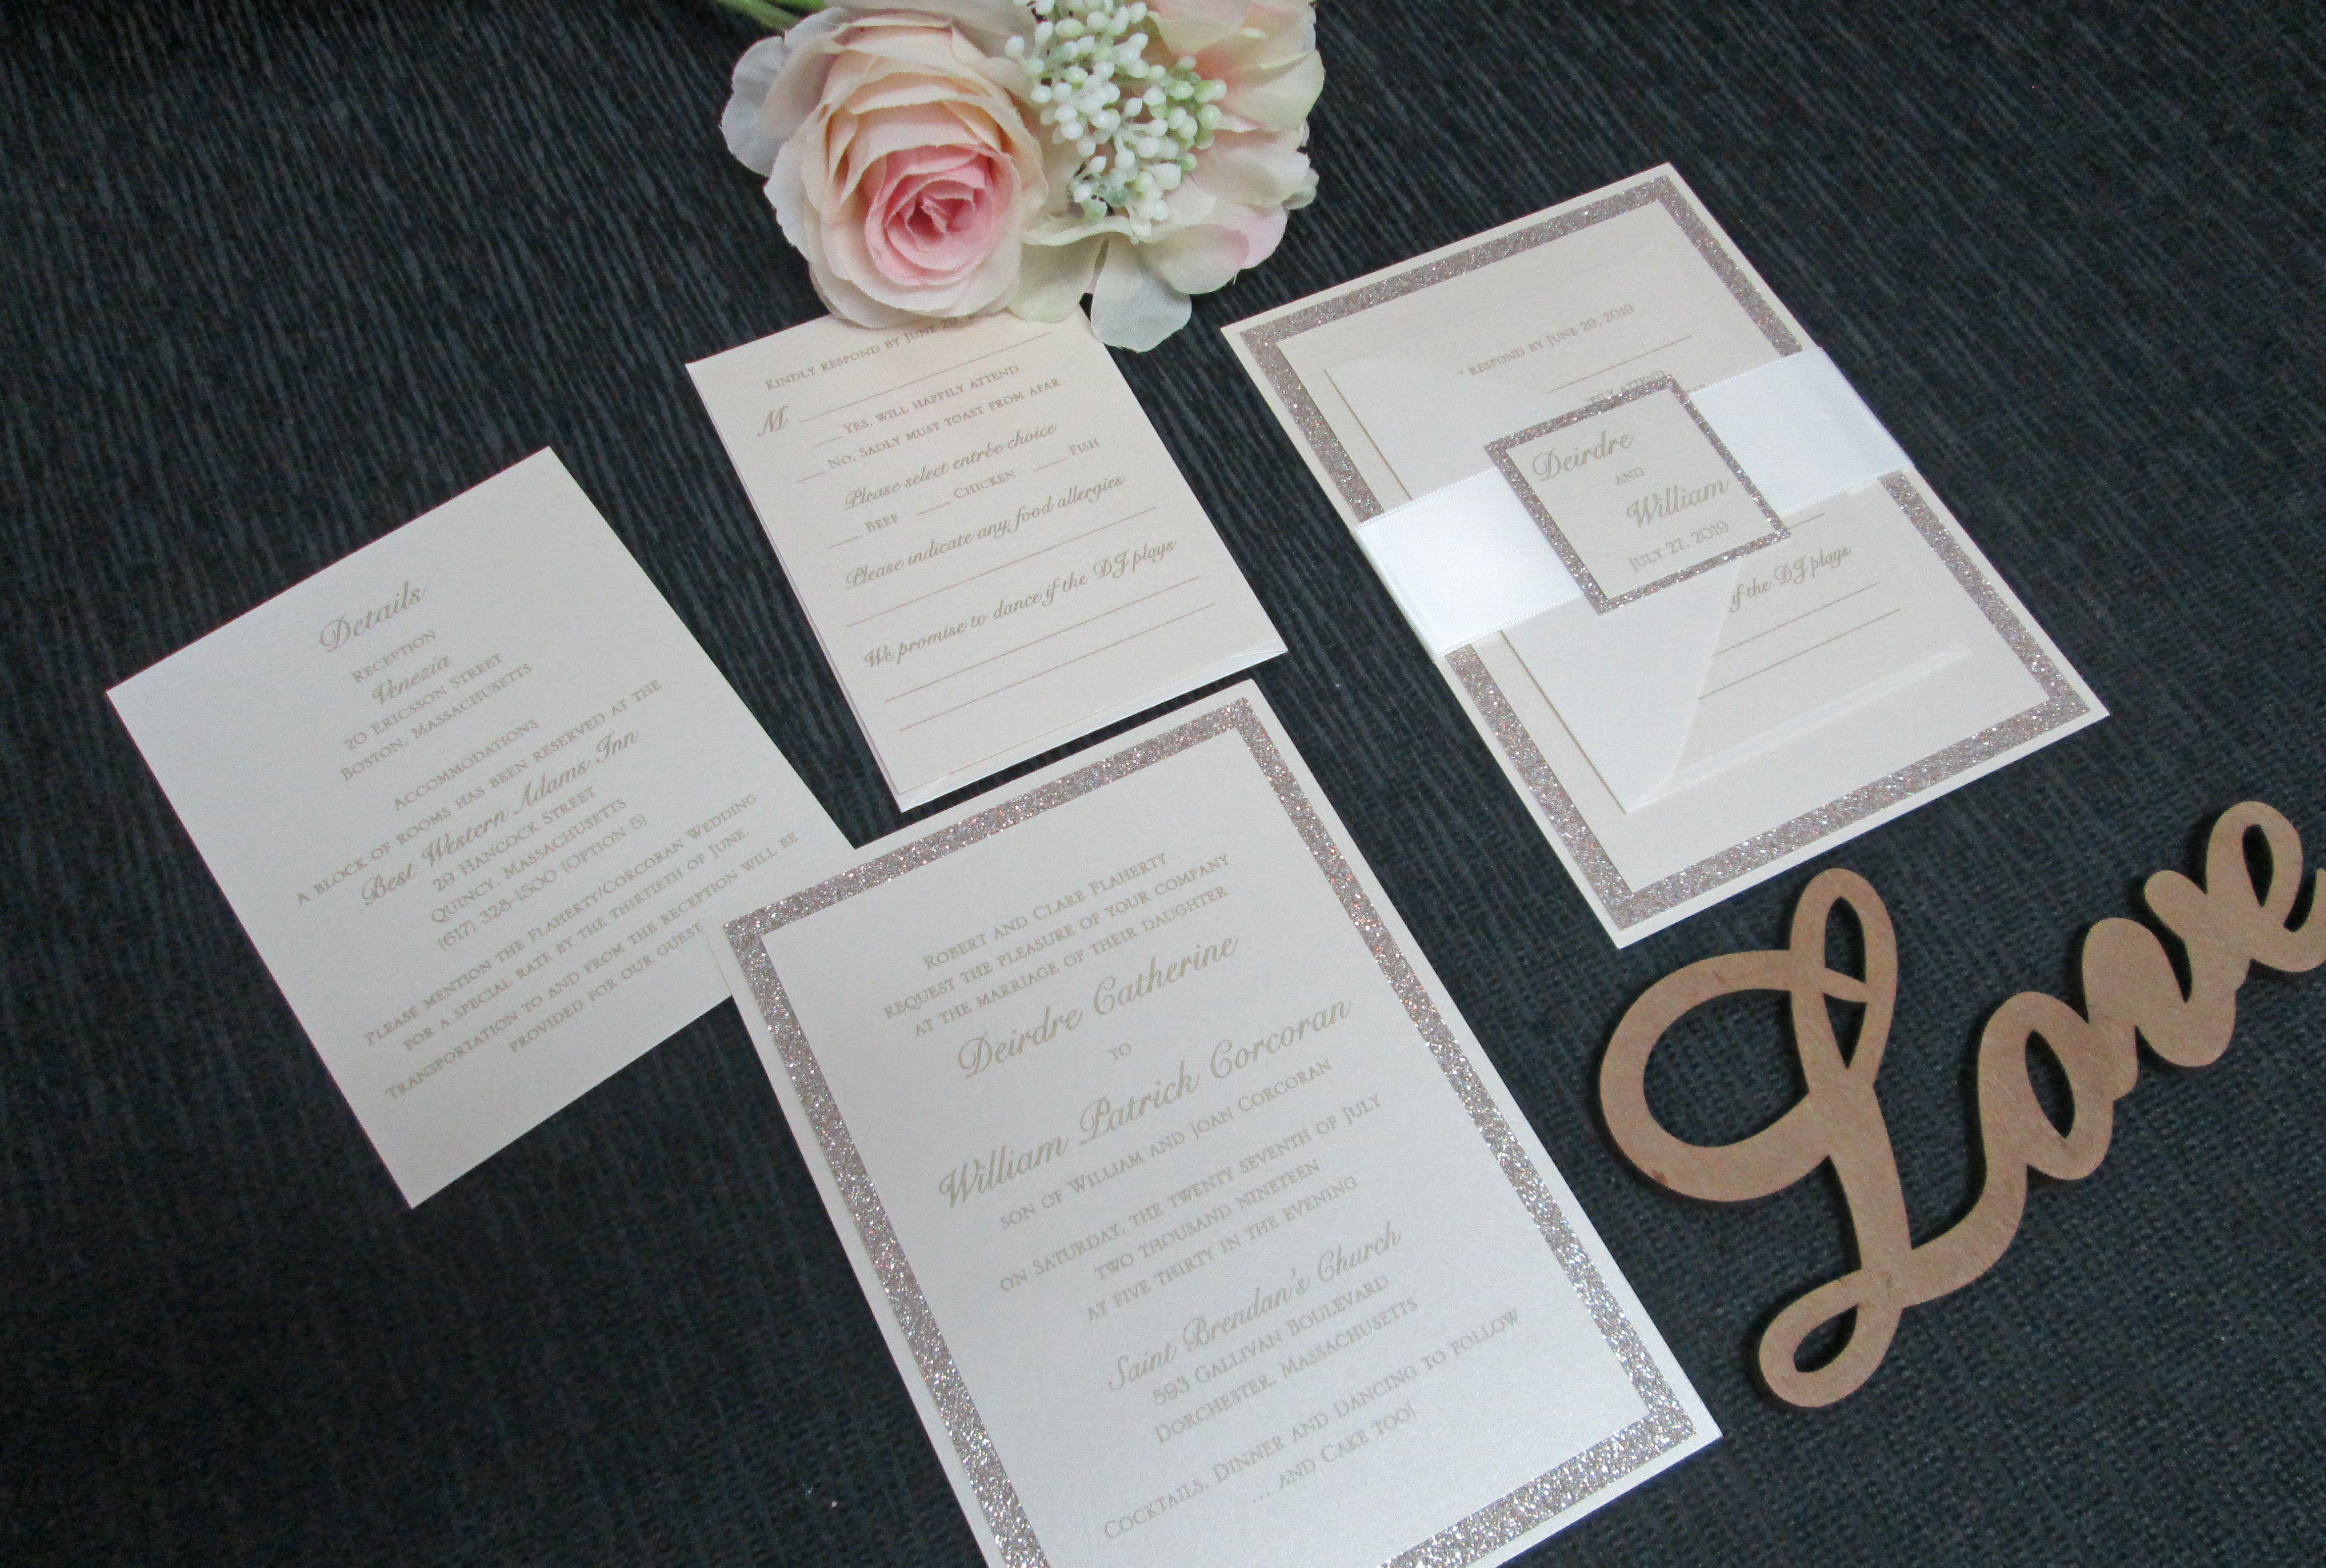 Gold Glitter Invitation Making Wedding Invitations Gold Glitter Invitation Wedding Invitations